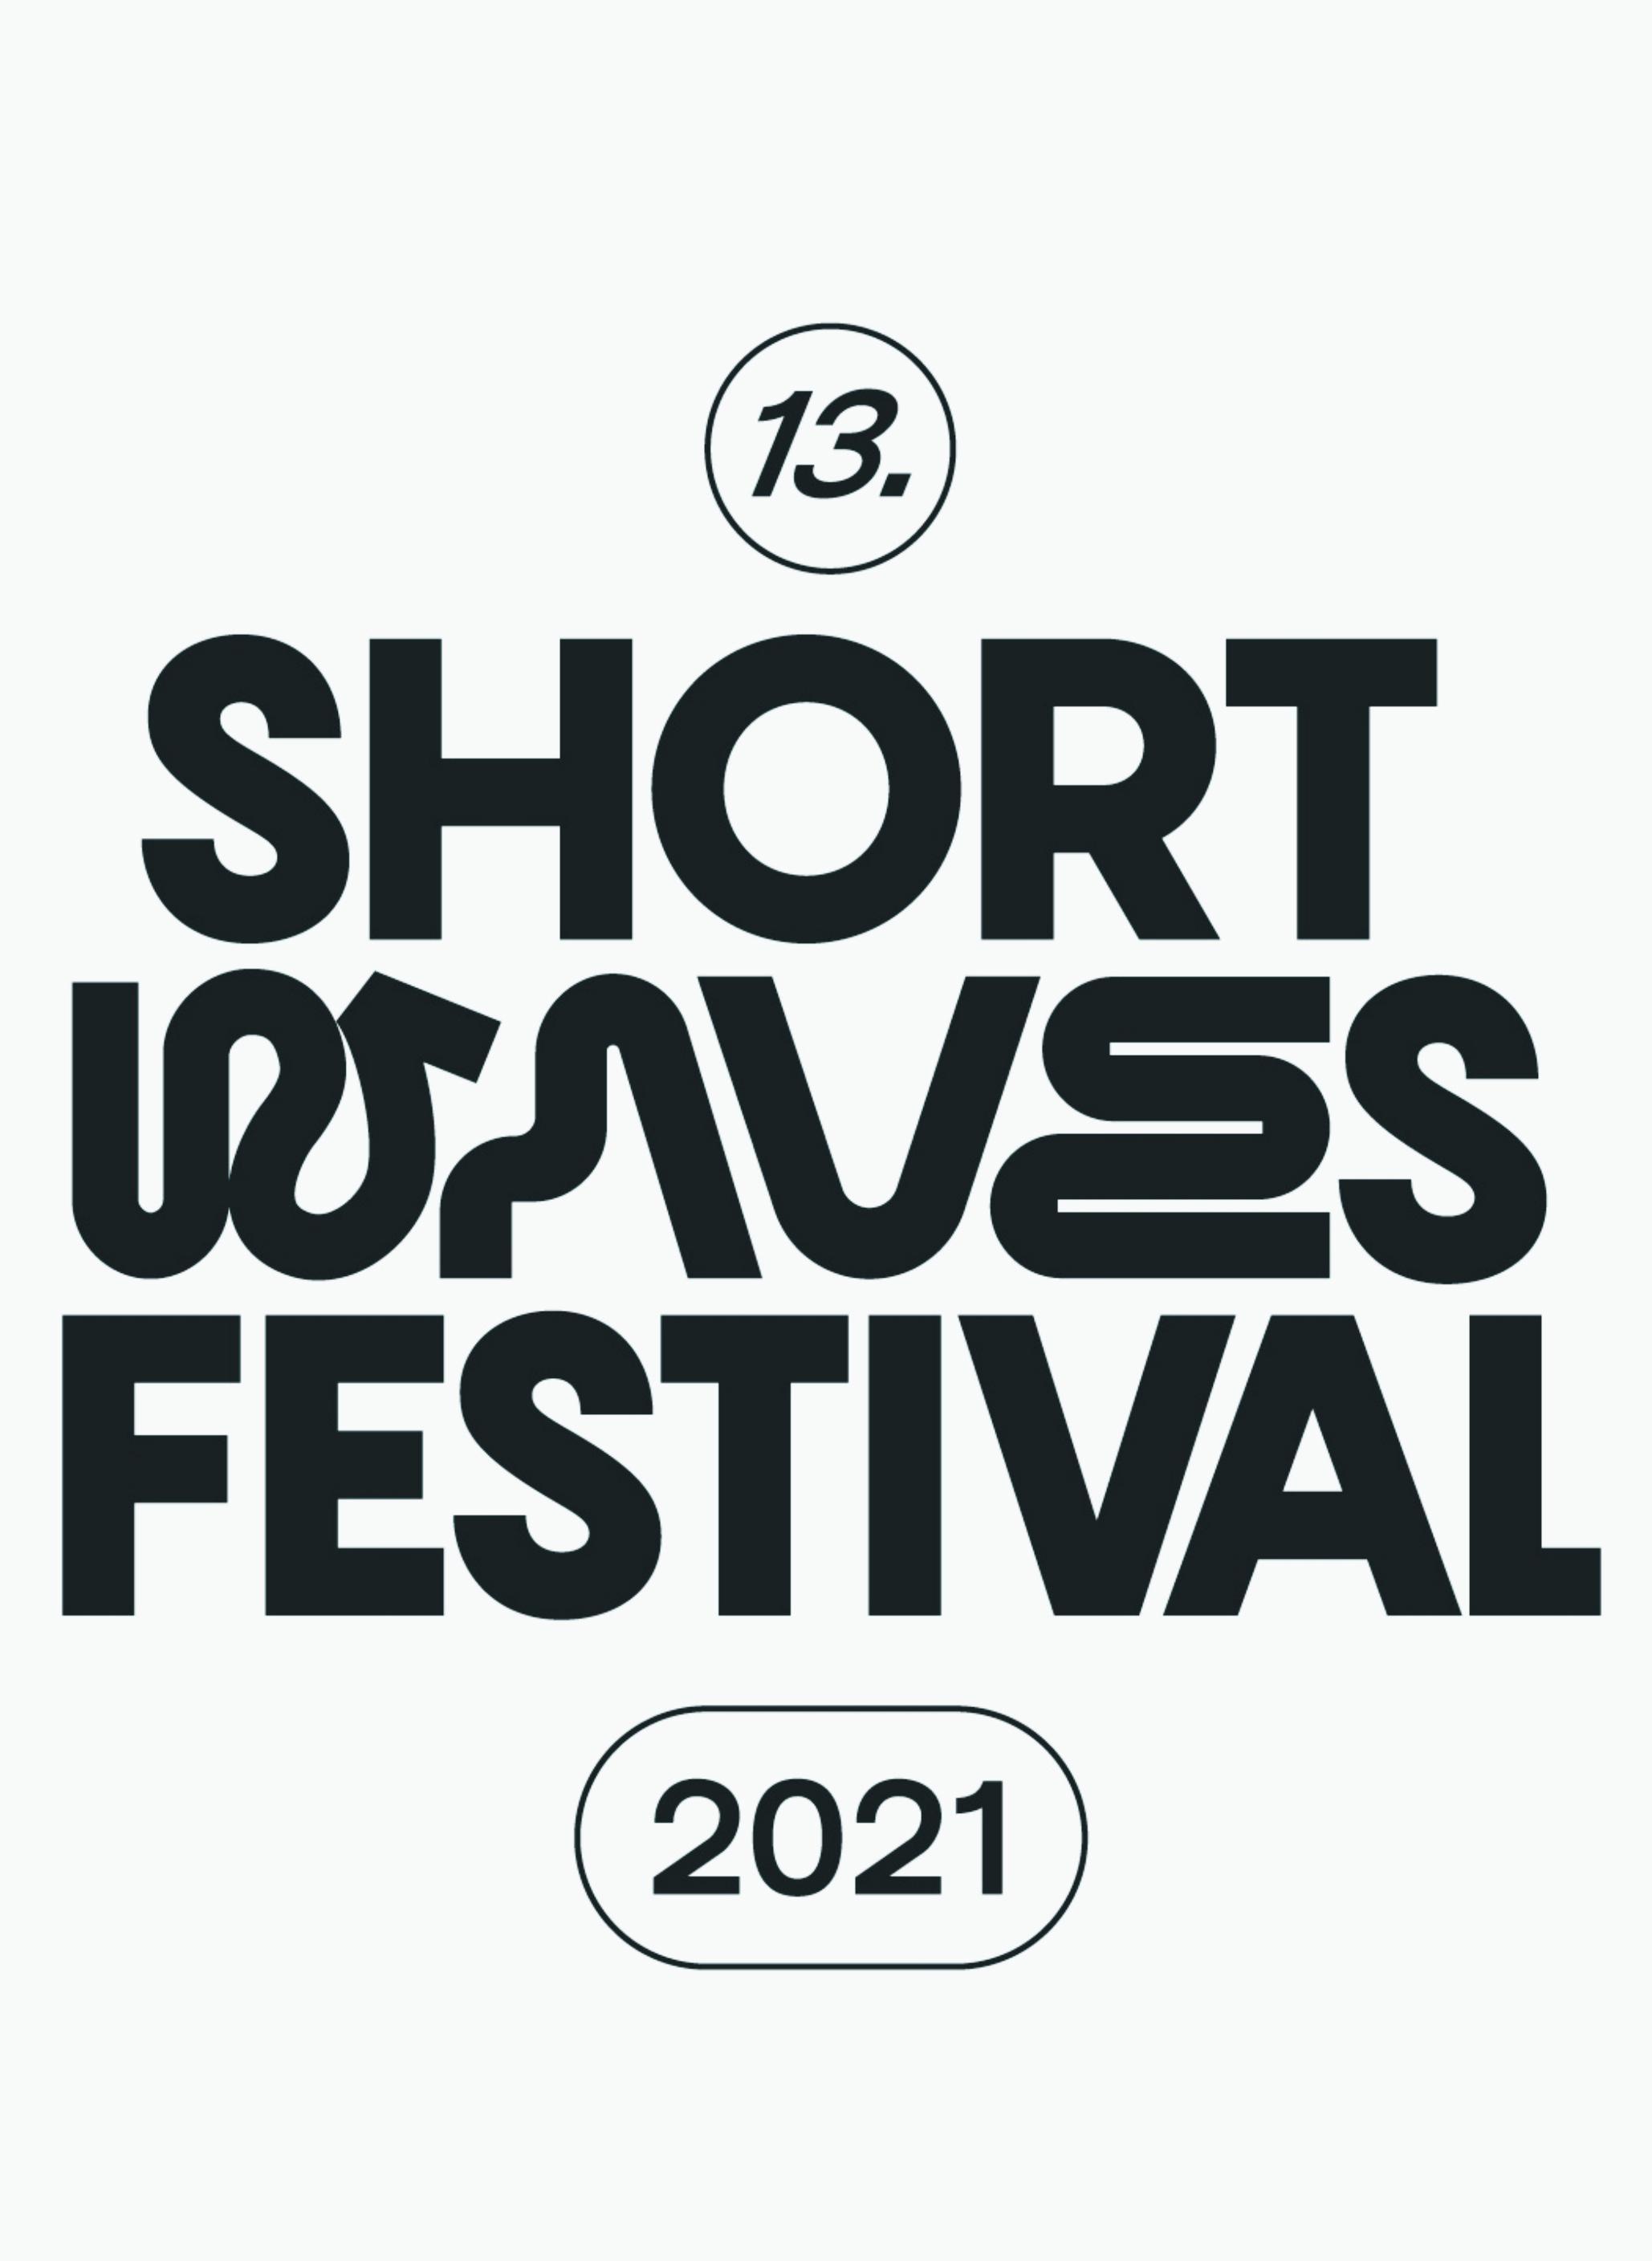 Short Waves Festival 2021 - Fokus: Mirror Mirror: Światy Równoległe